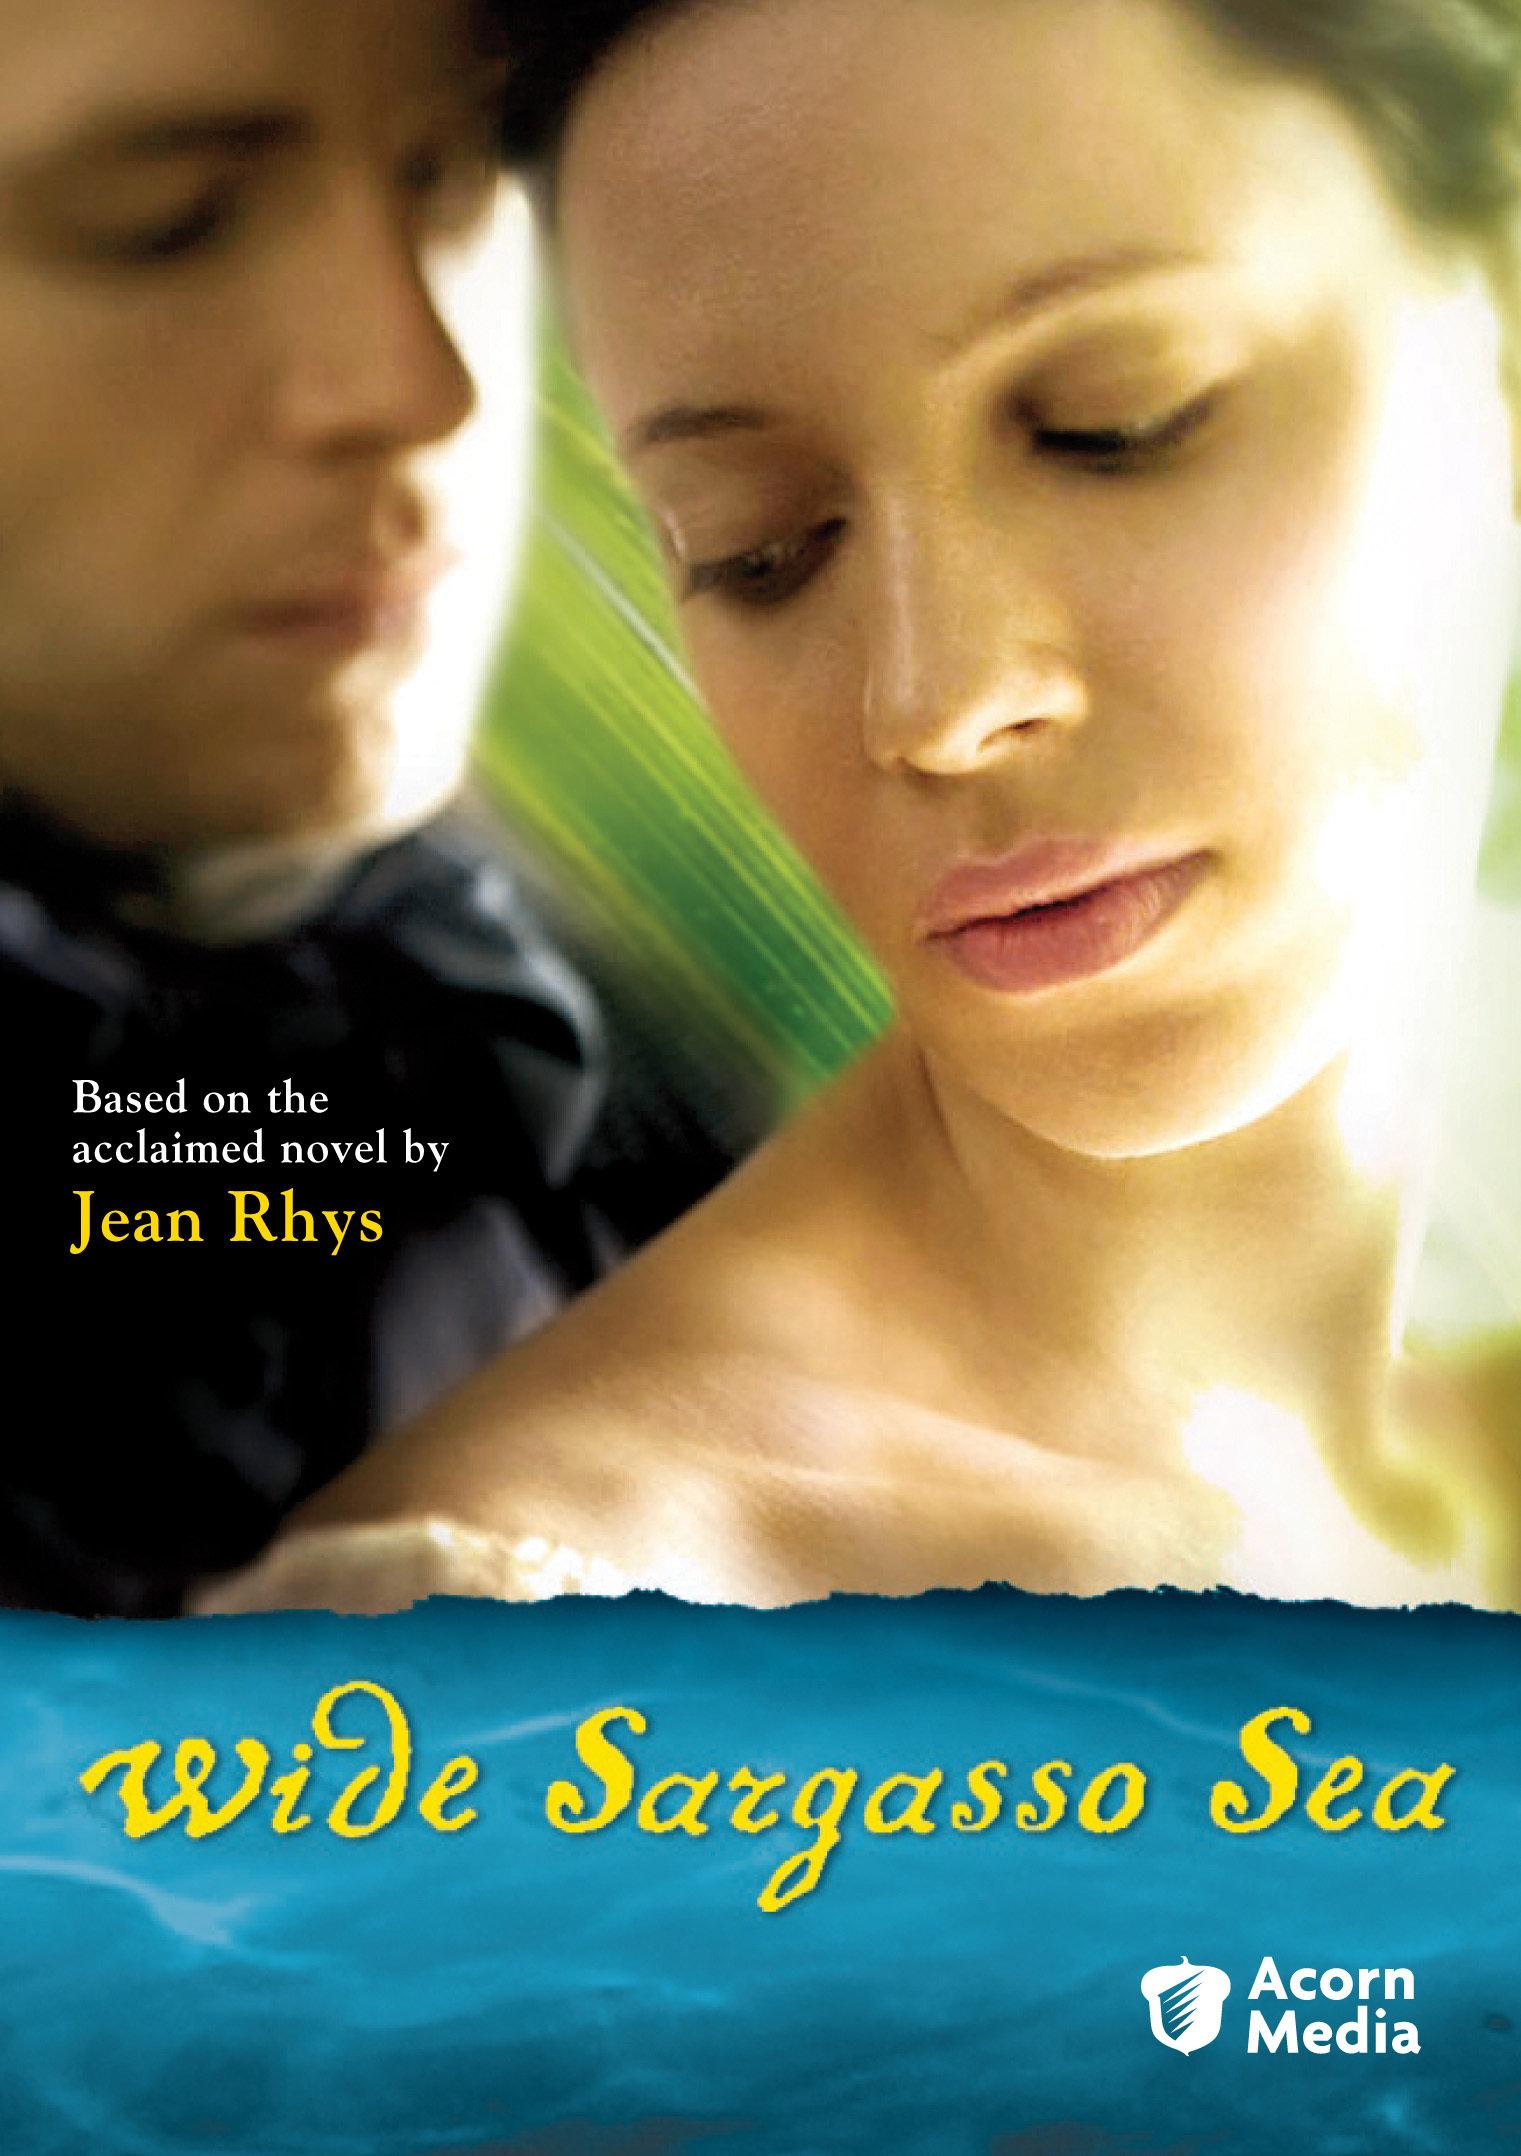 Wild sargasso sea movie sex clip speaking